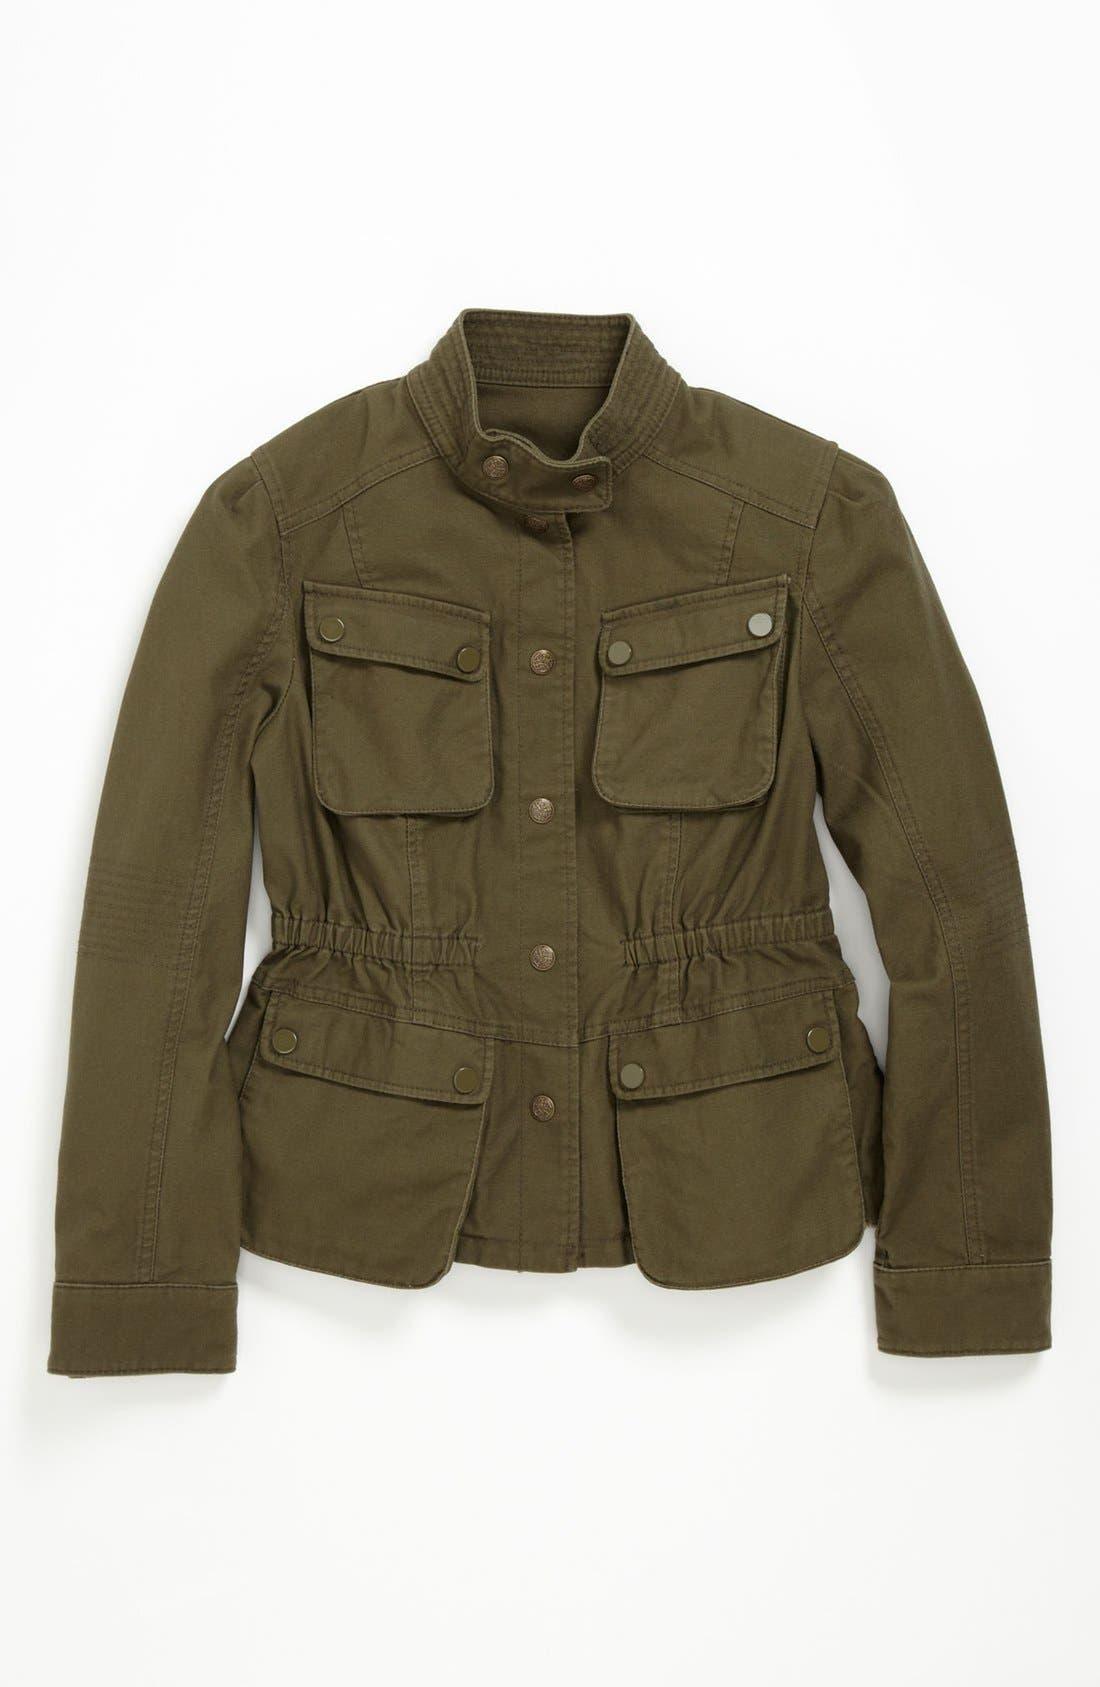 Alternate Image 1 Selected - Collection B Cotton Cargo Jacket (Big Girls)